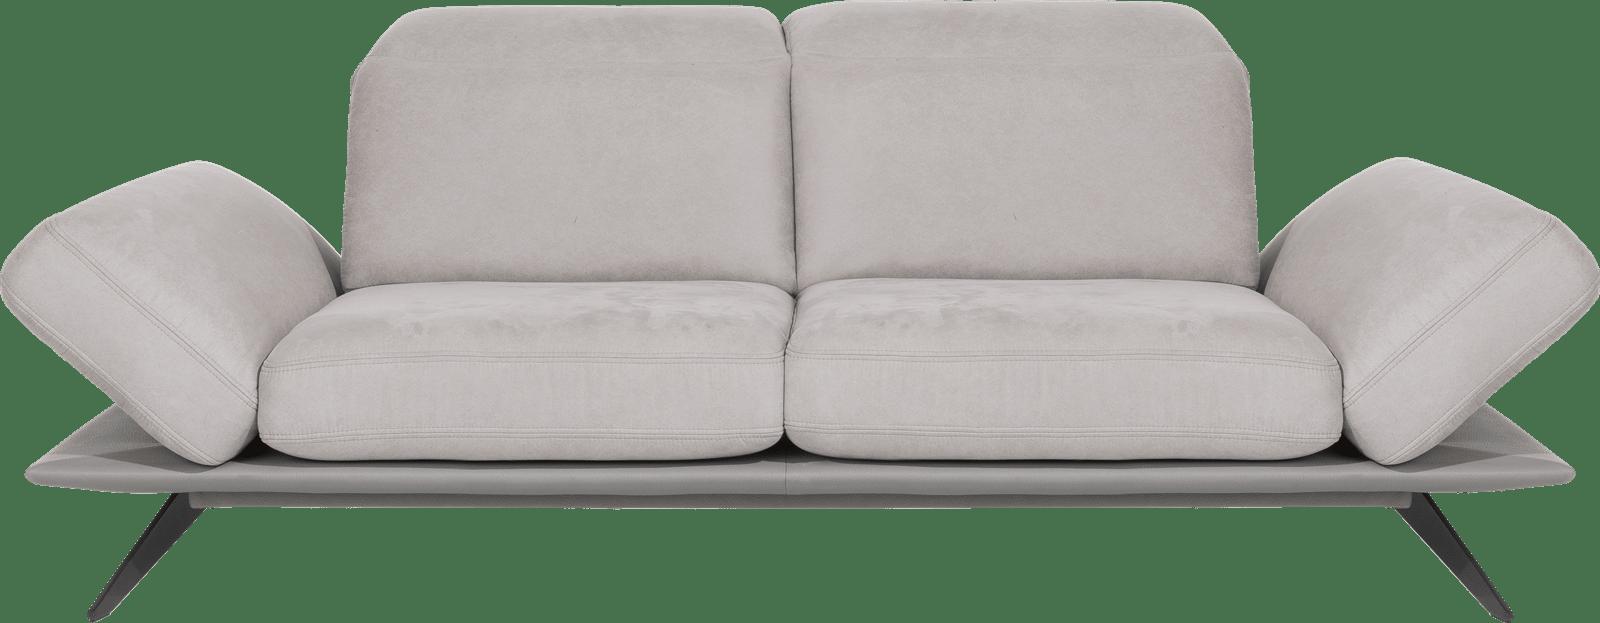 XOOON - Paxos - Minimalistisches Design - Sofas - 2.5-sitzer